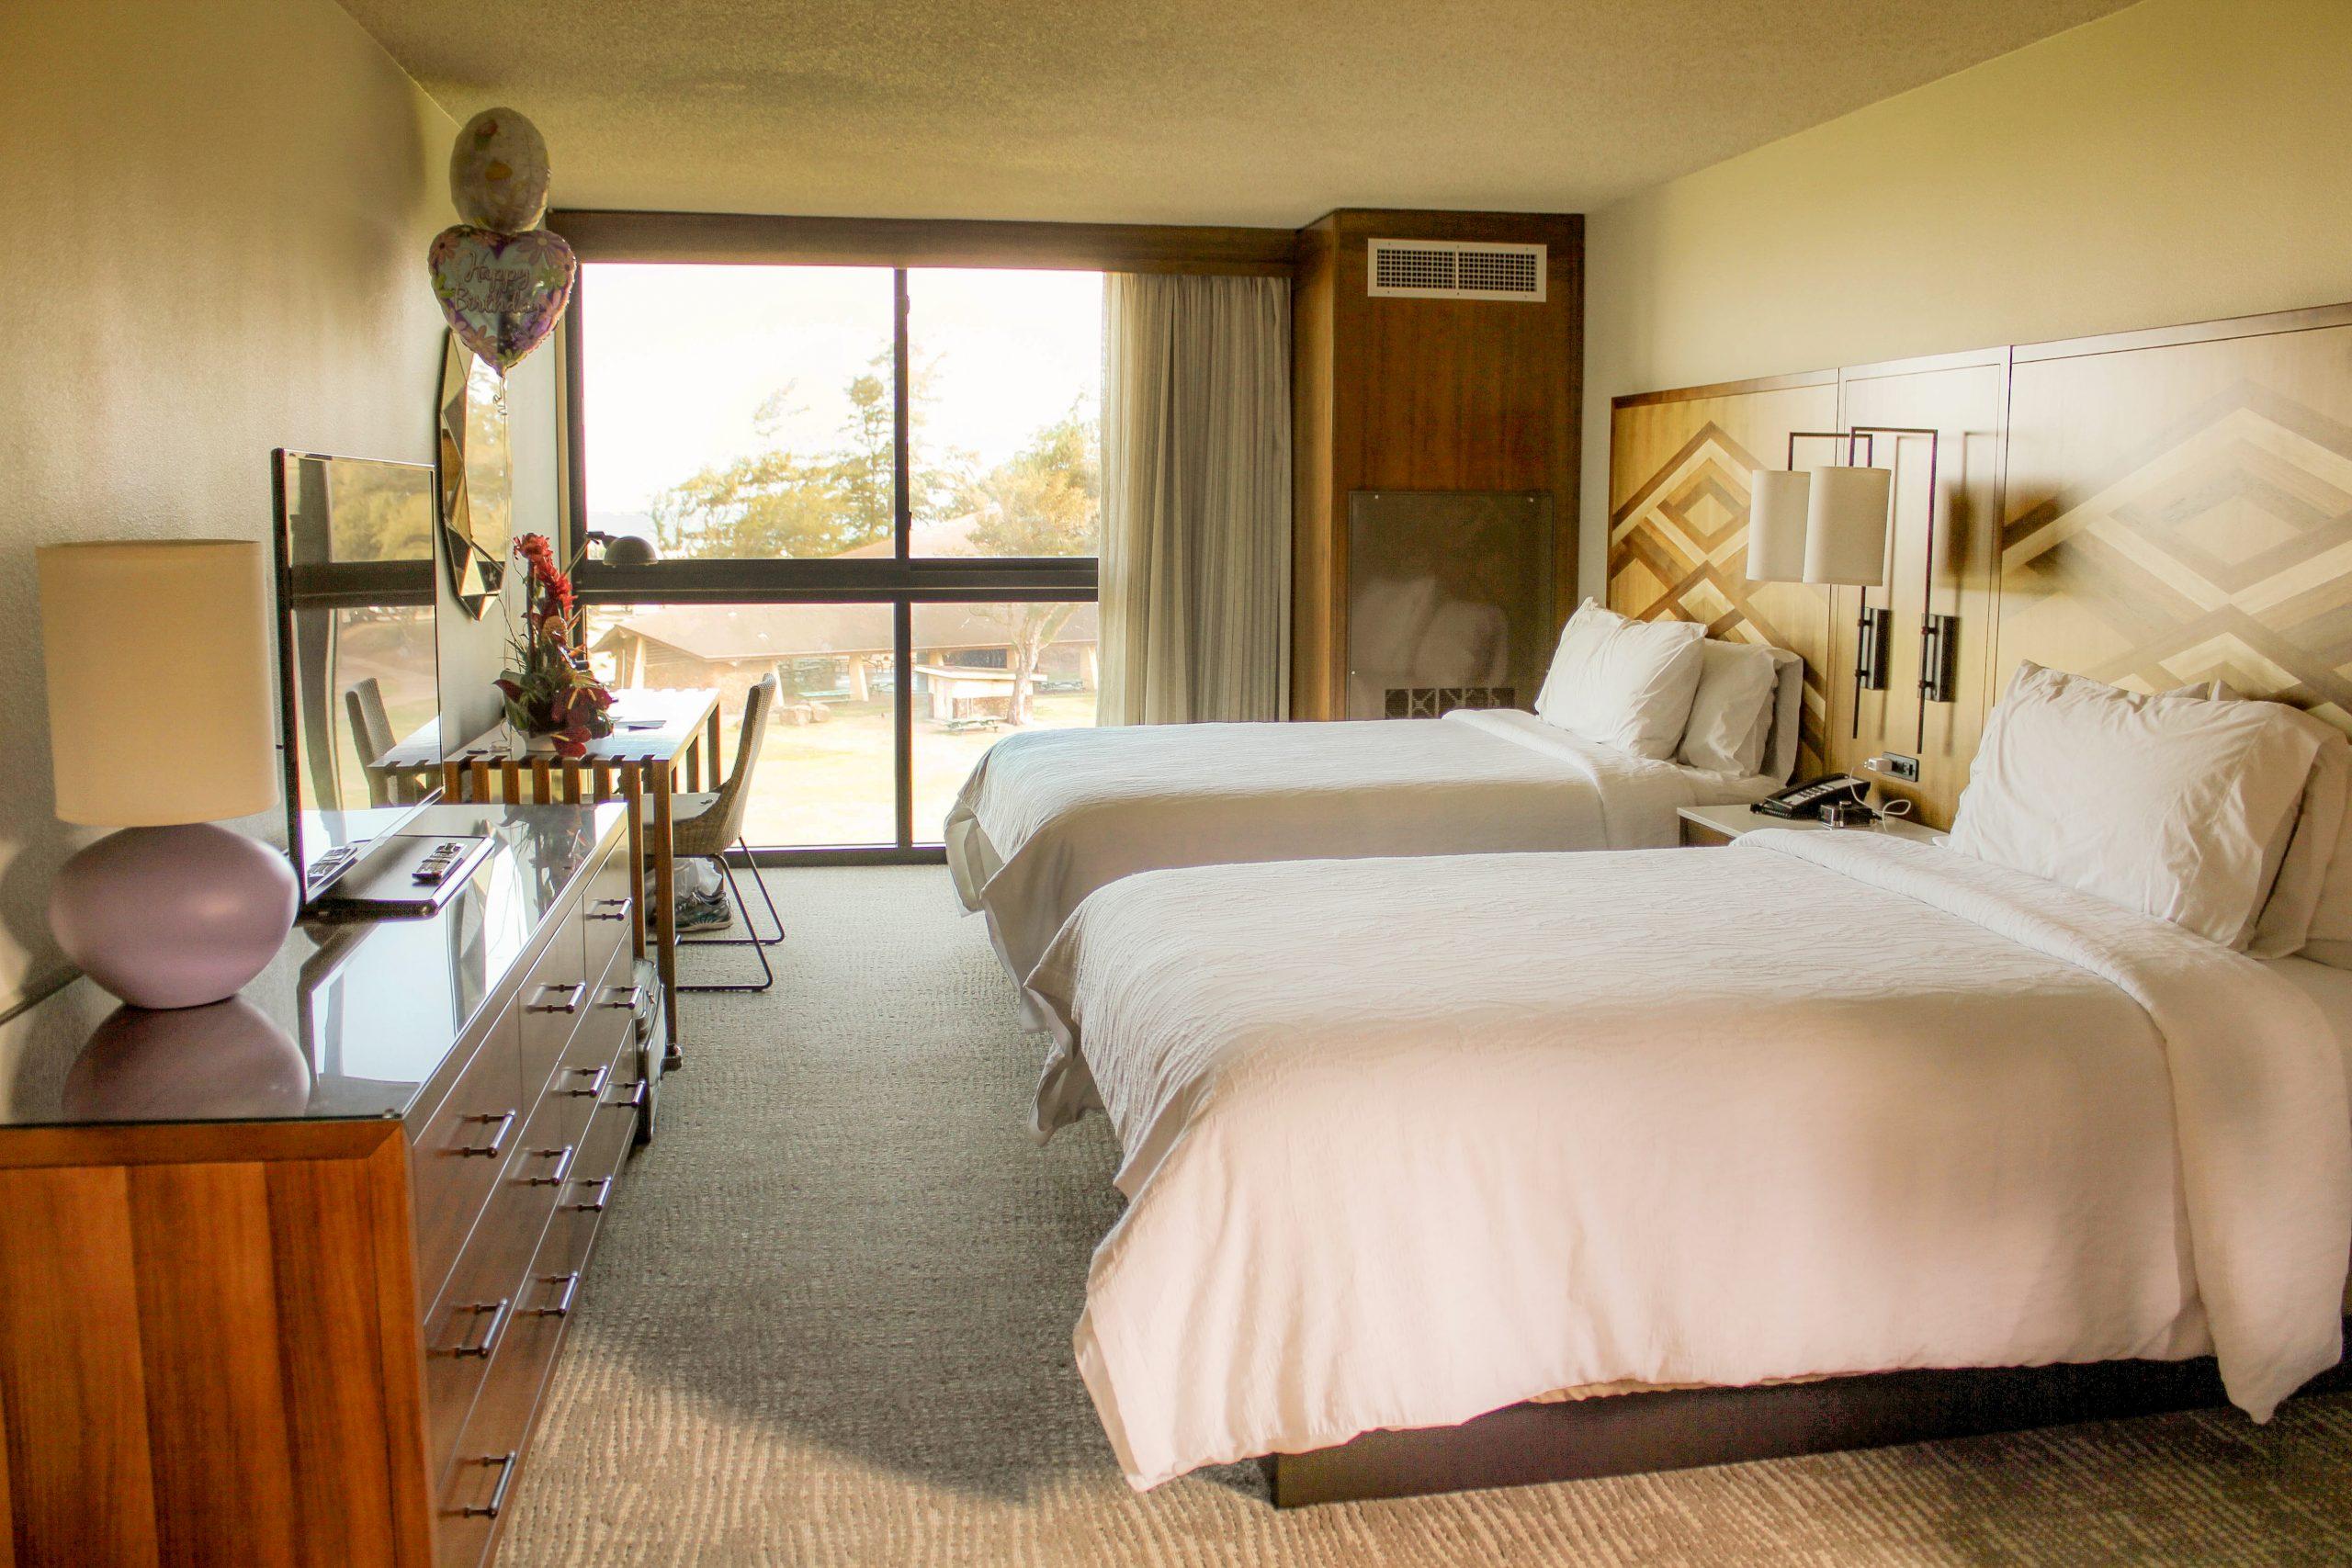 Hilton Garden Inn Junior Suite, Kauai, Hawaii USA